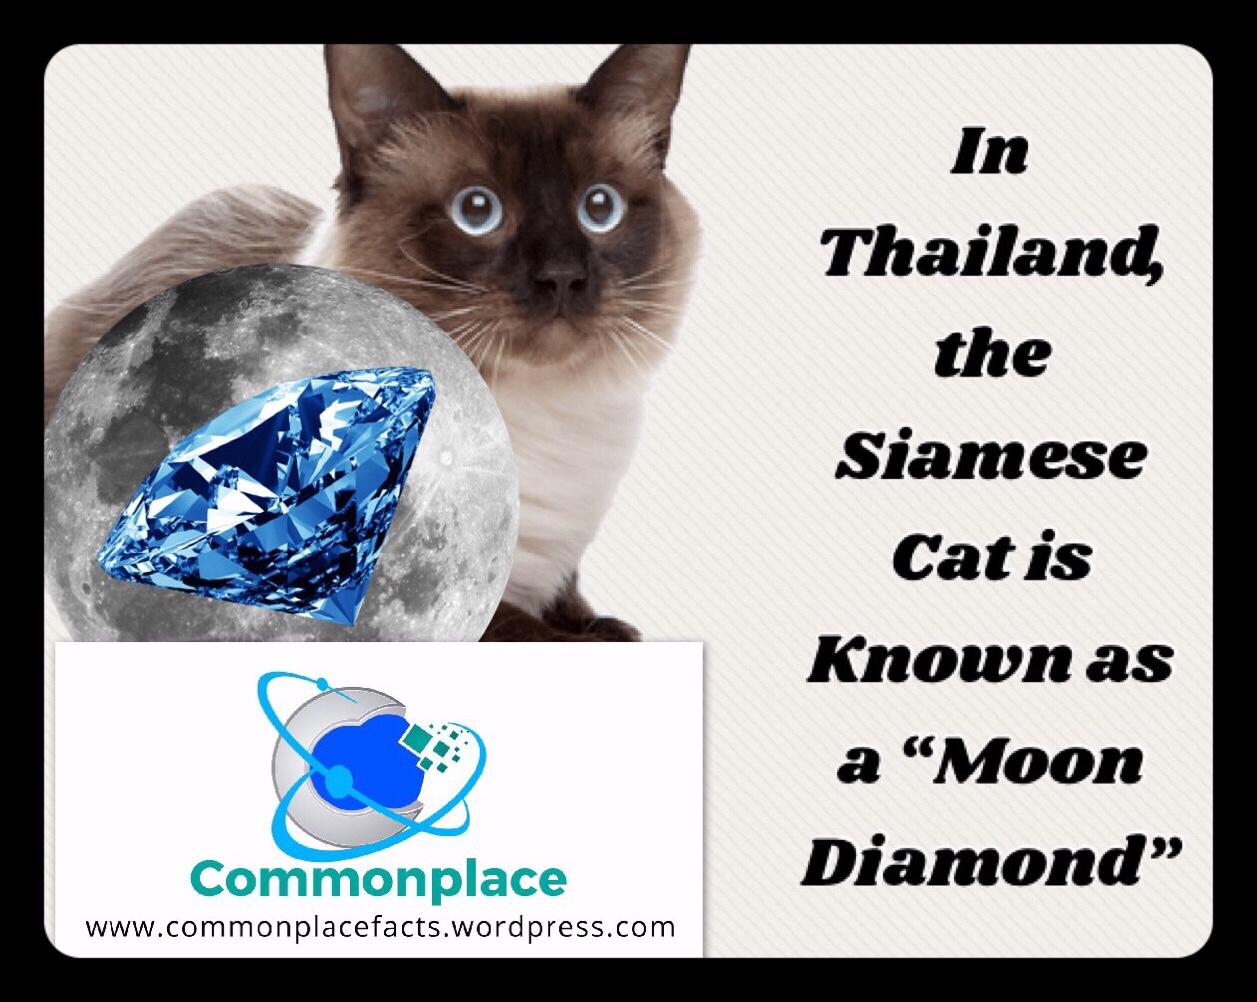 #siamesecat #cats #thailand #diamonds #moon #languages